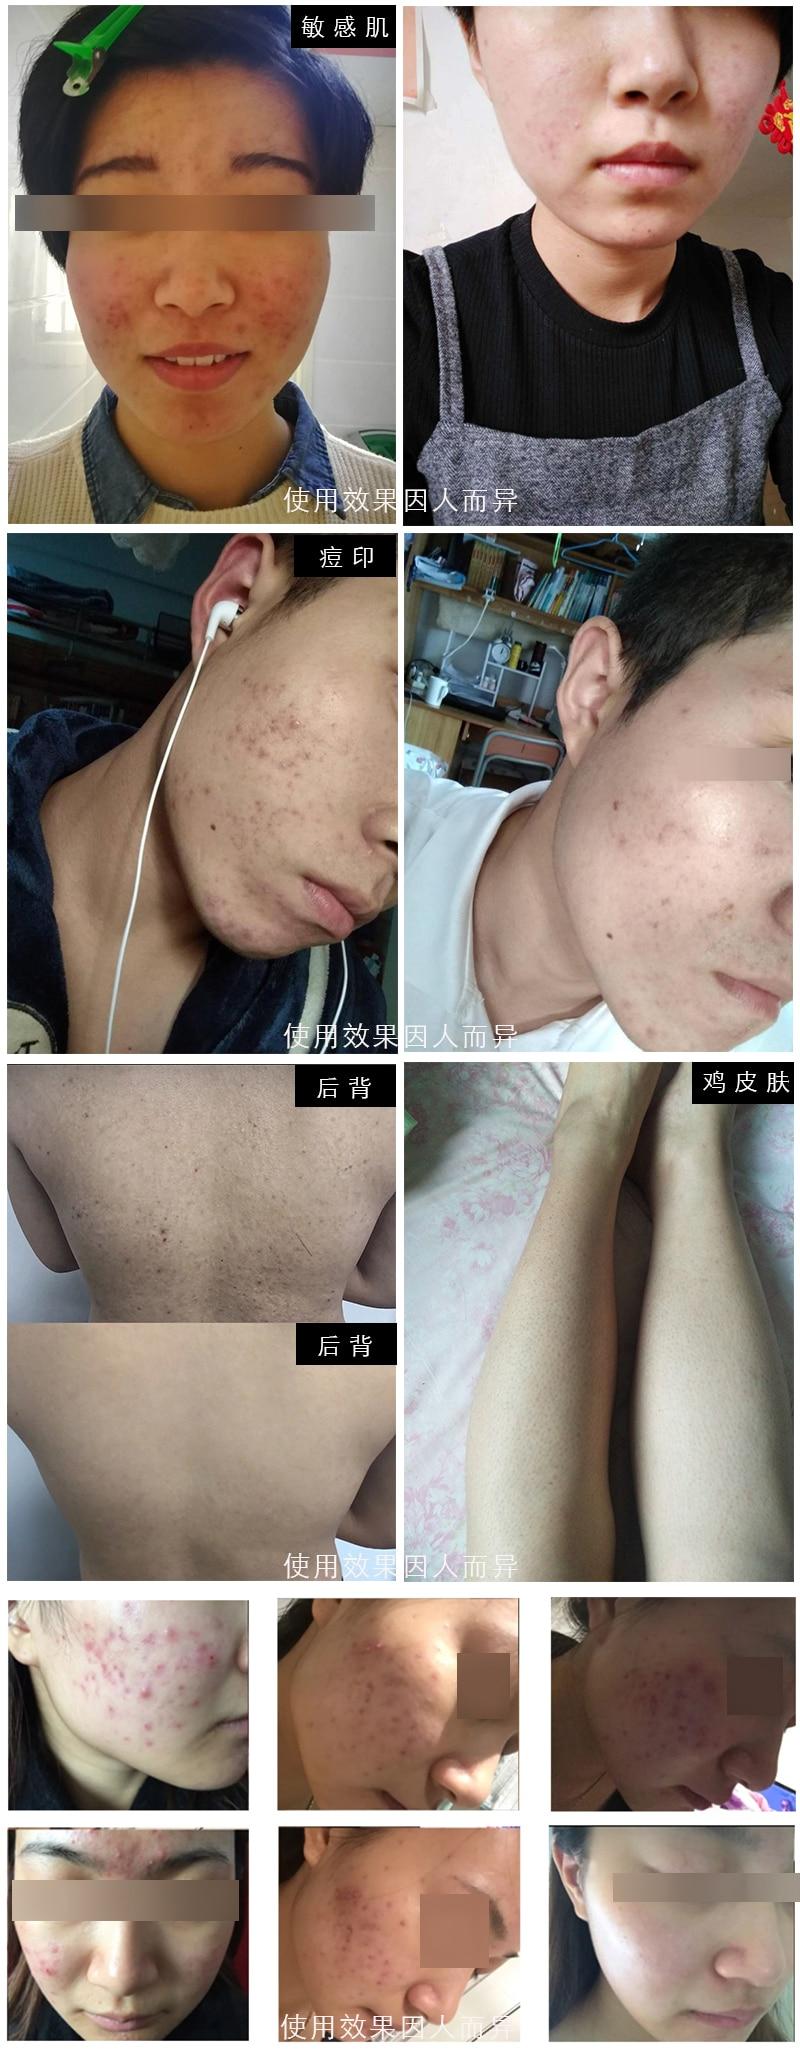 bha esfoliante facial cleaner cravo acne pimple remover remendo acne creme